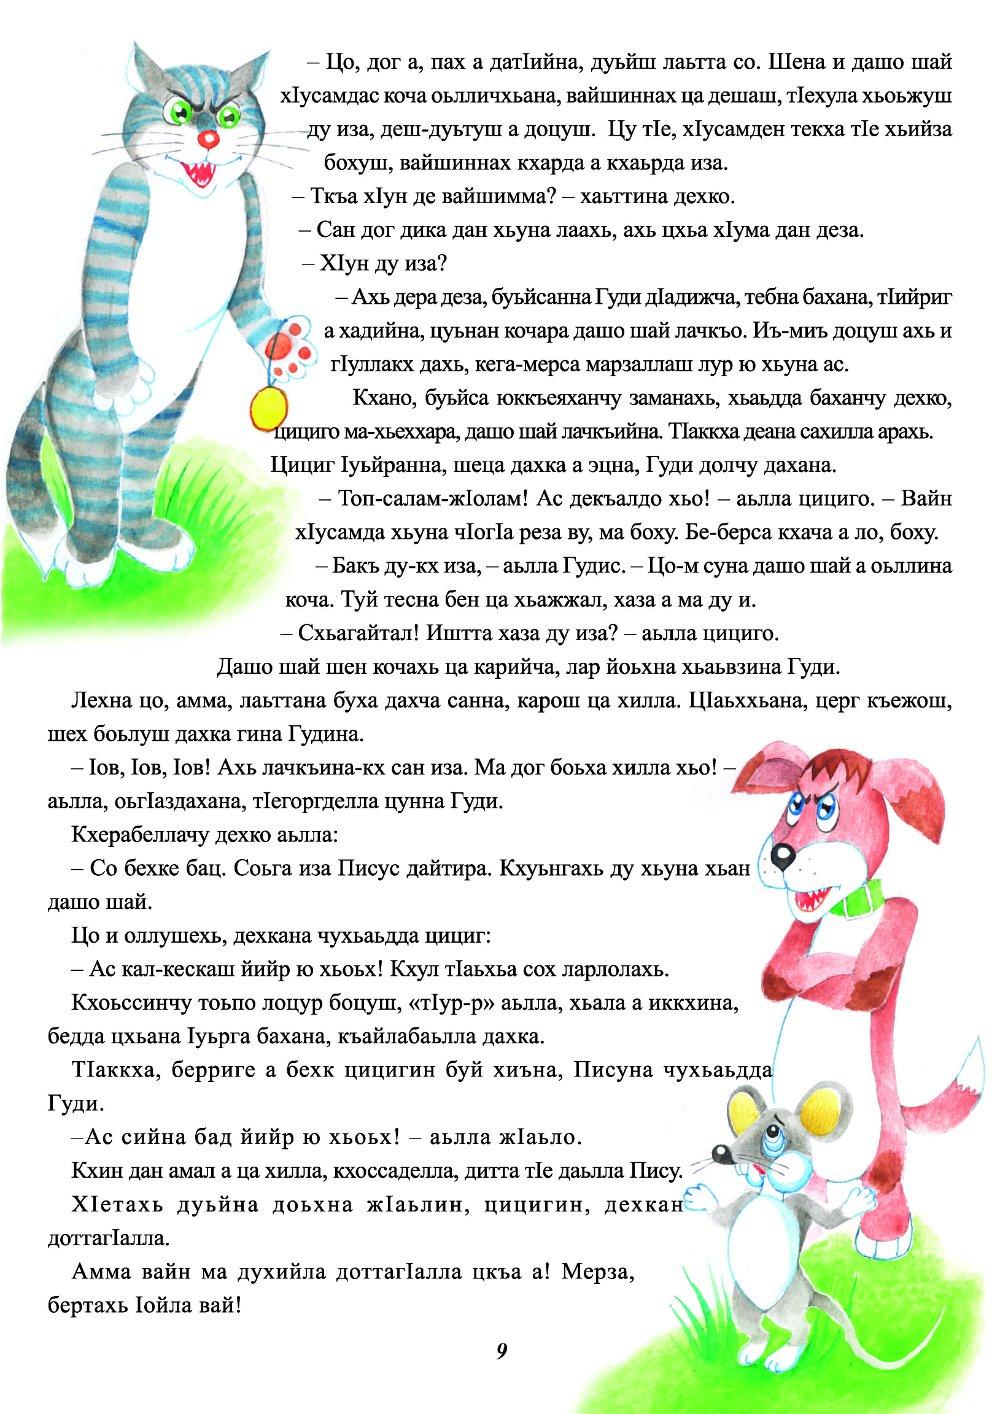 Сказки на чеченском языке бесплатно скачать, Tales chechen language chechenian tales free download